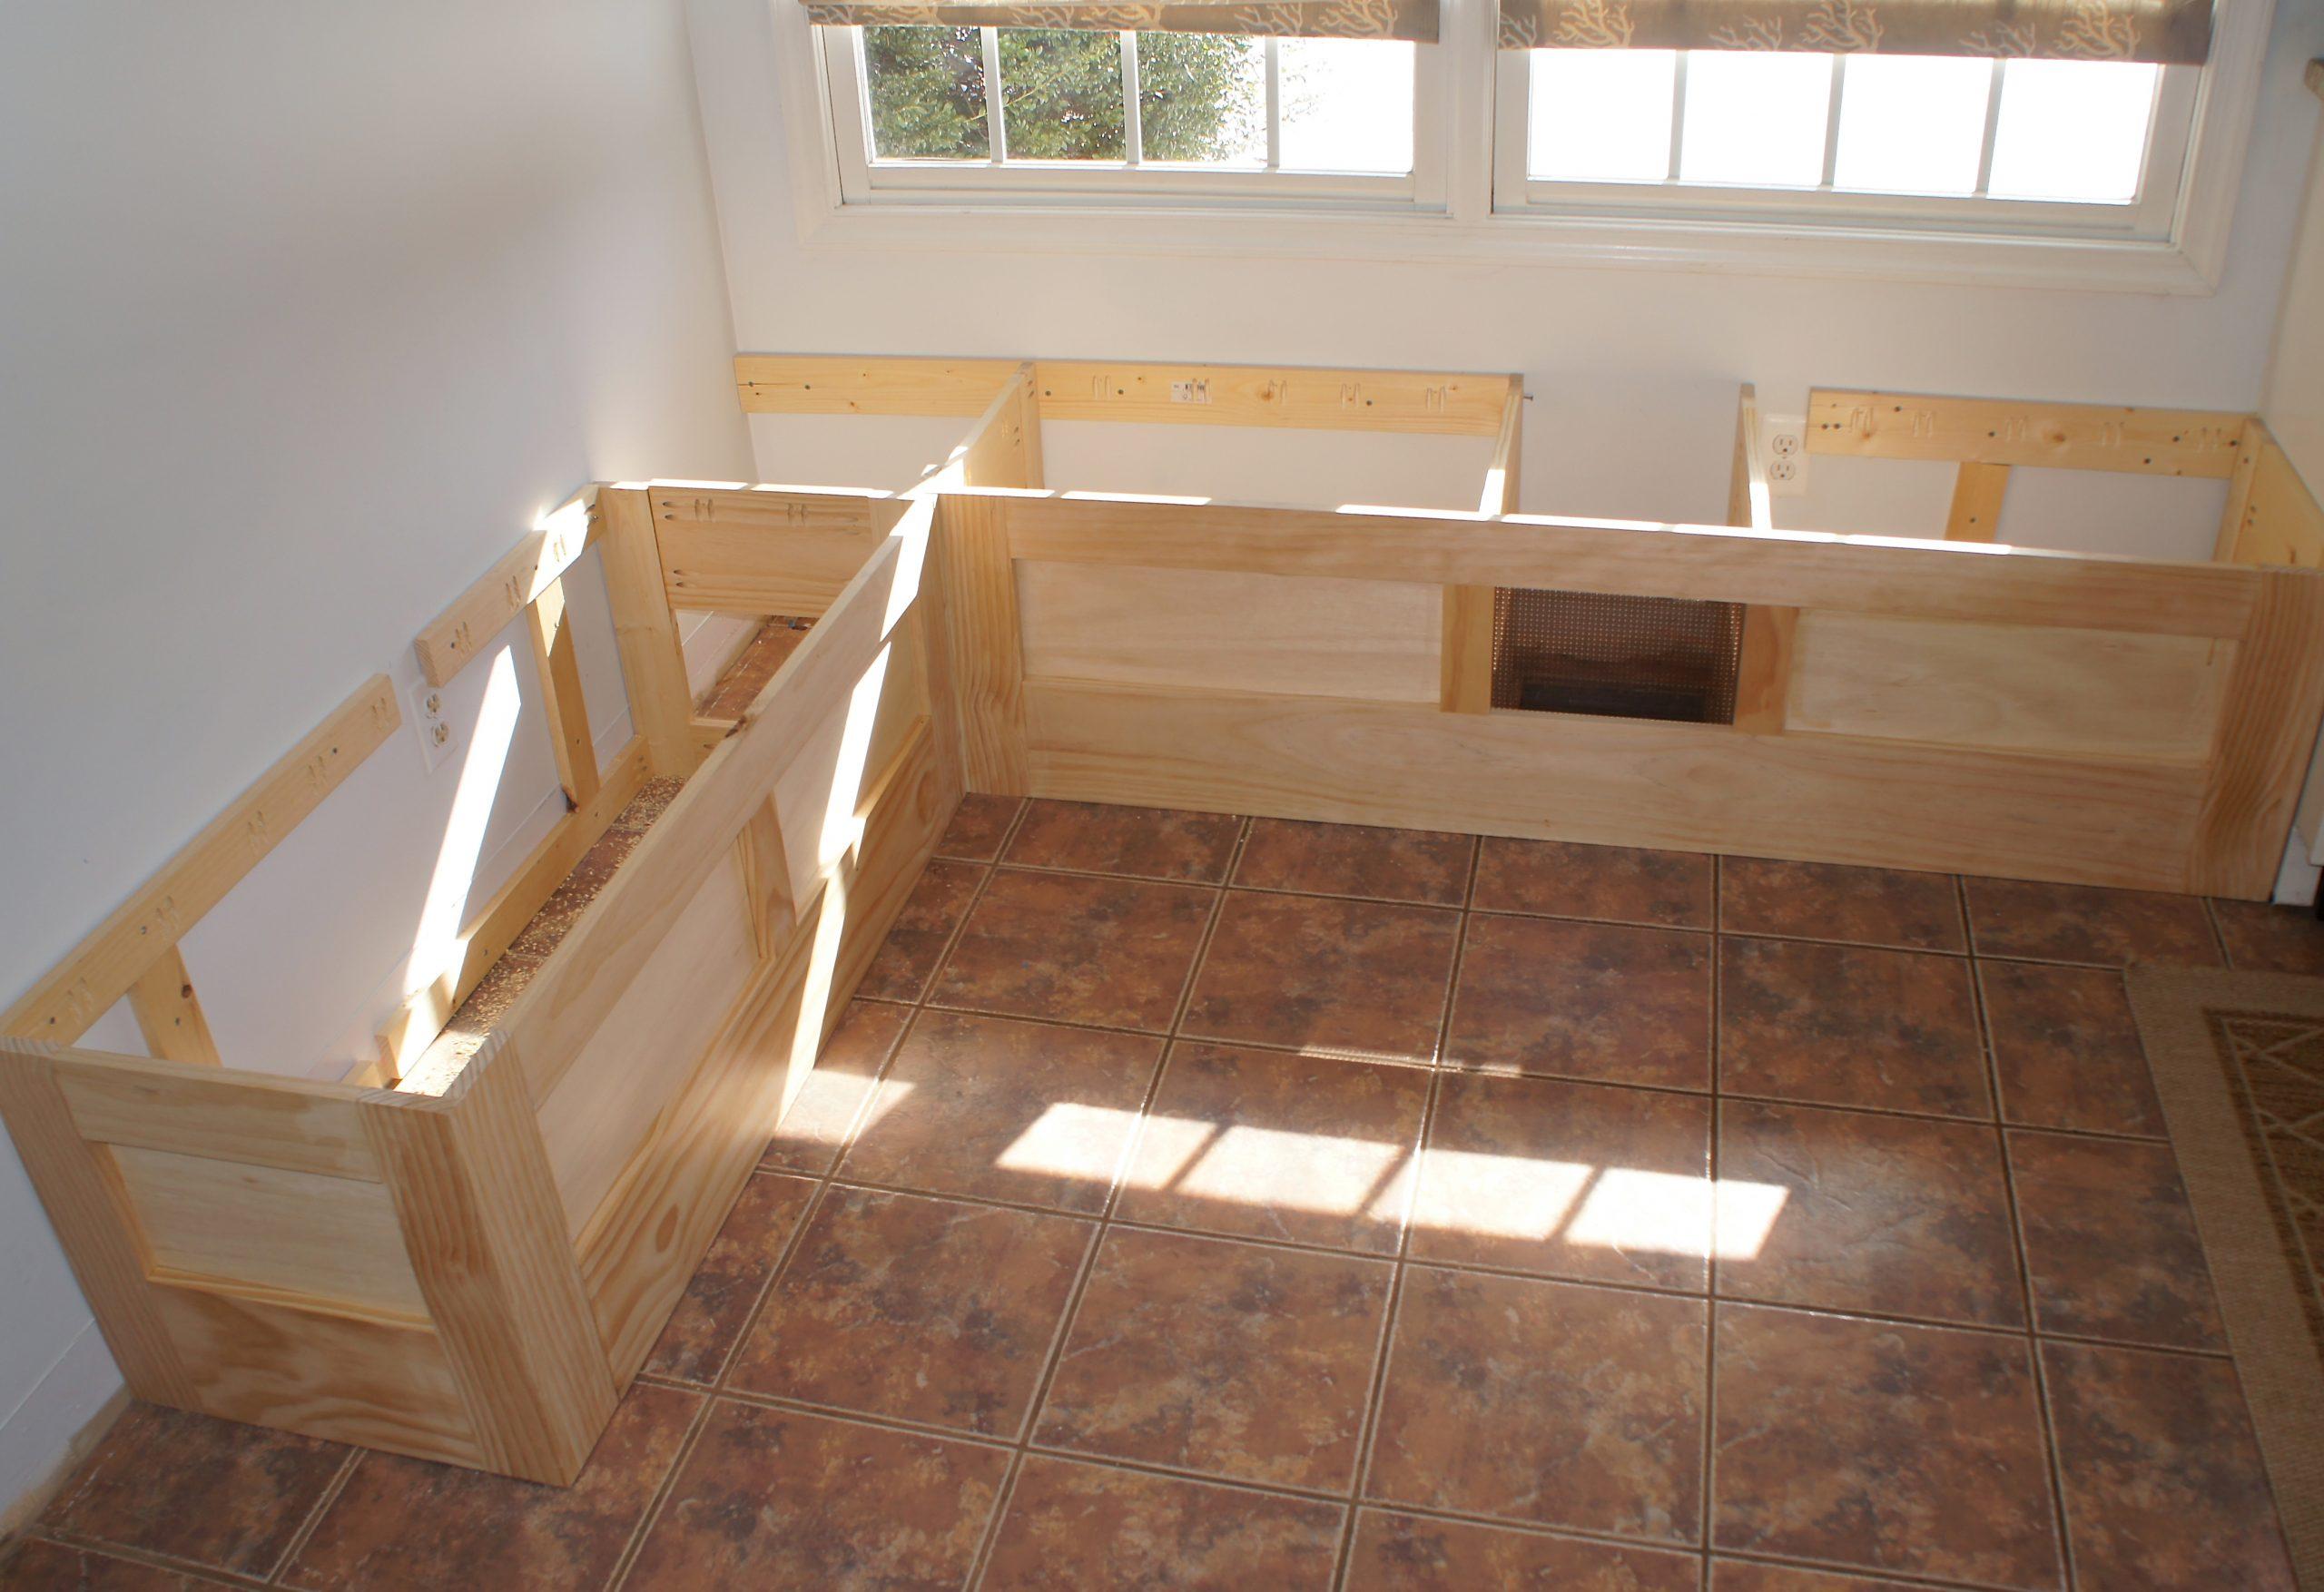 Make Diy Kitchen Booth Seating Schmidt Gallery Design